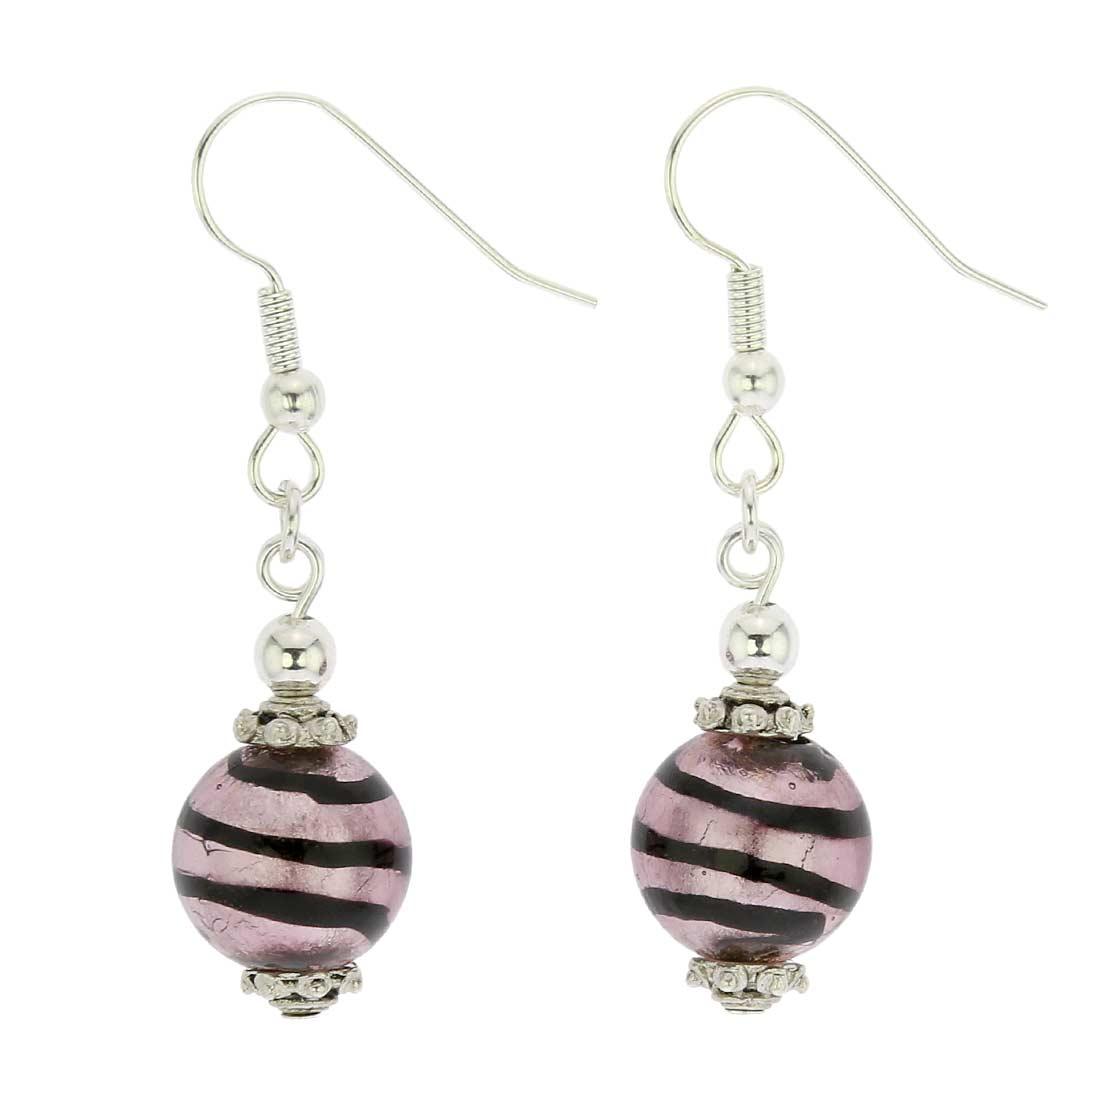 Antico Tesoro Balls Earrings - Striped Silver Purple